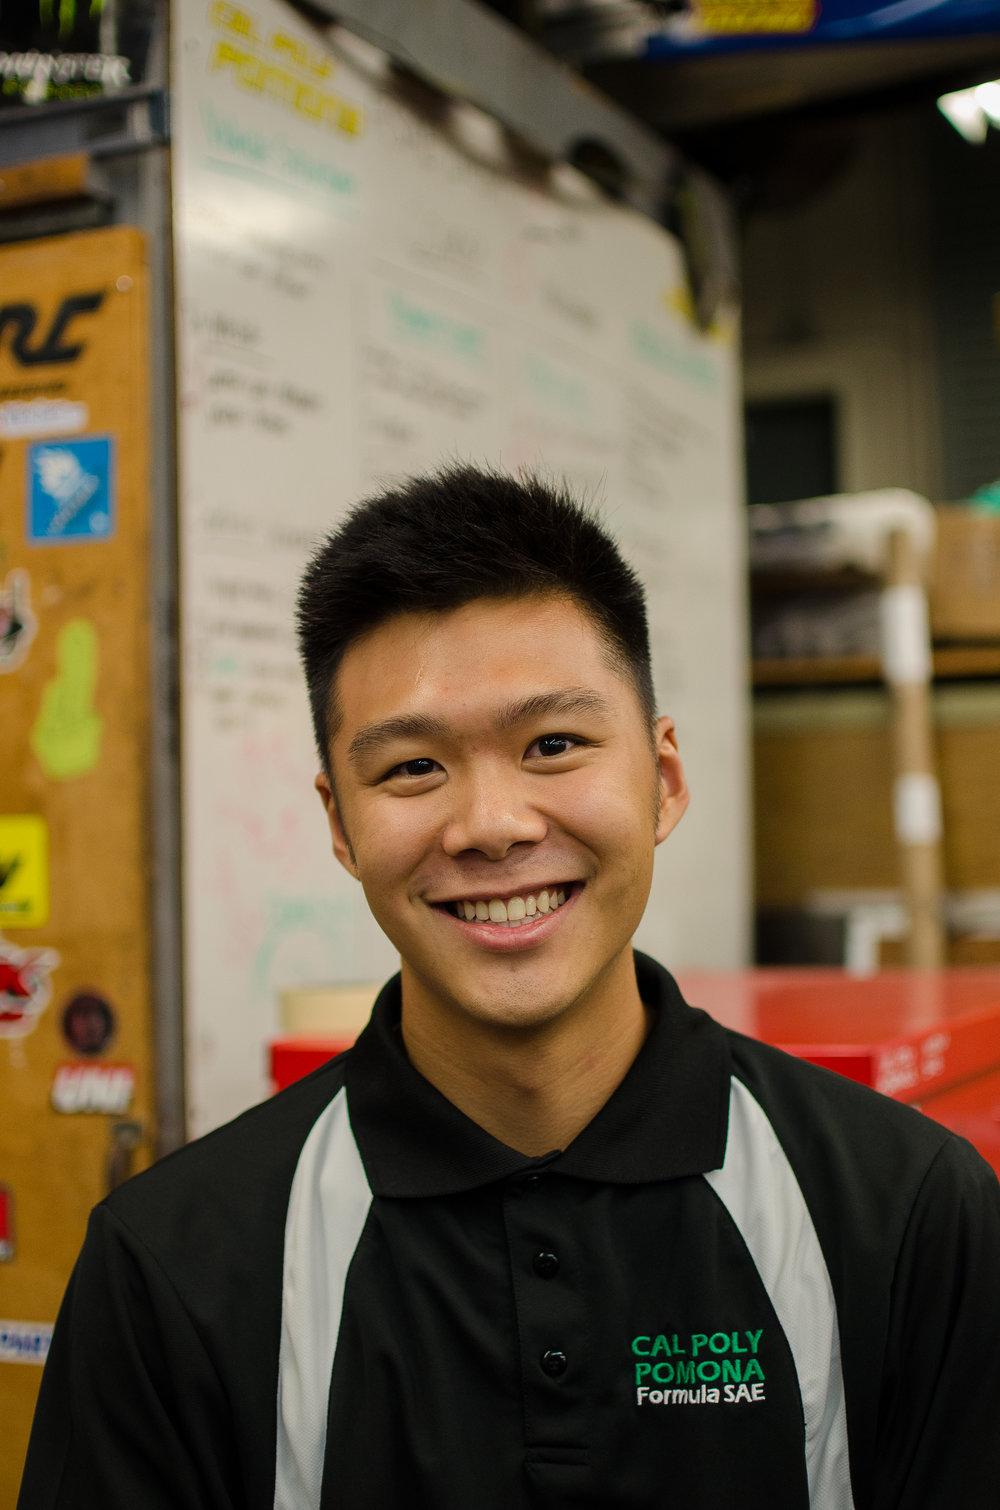 kevin wong Powertrain Lead Intake/Turbo Captain kwong1@cpp.edu